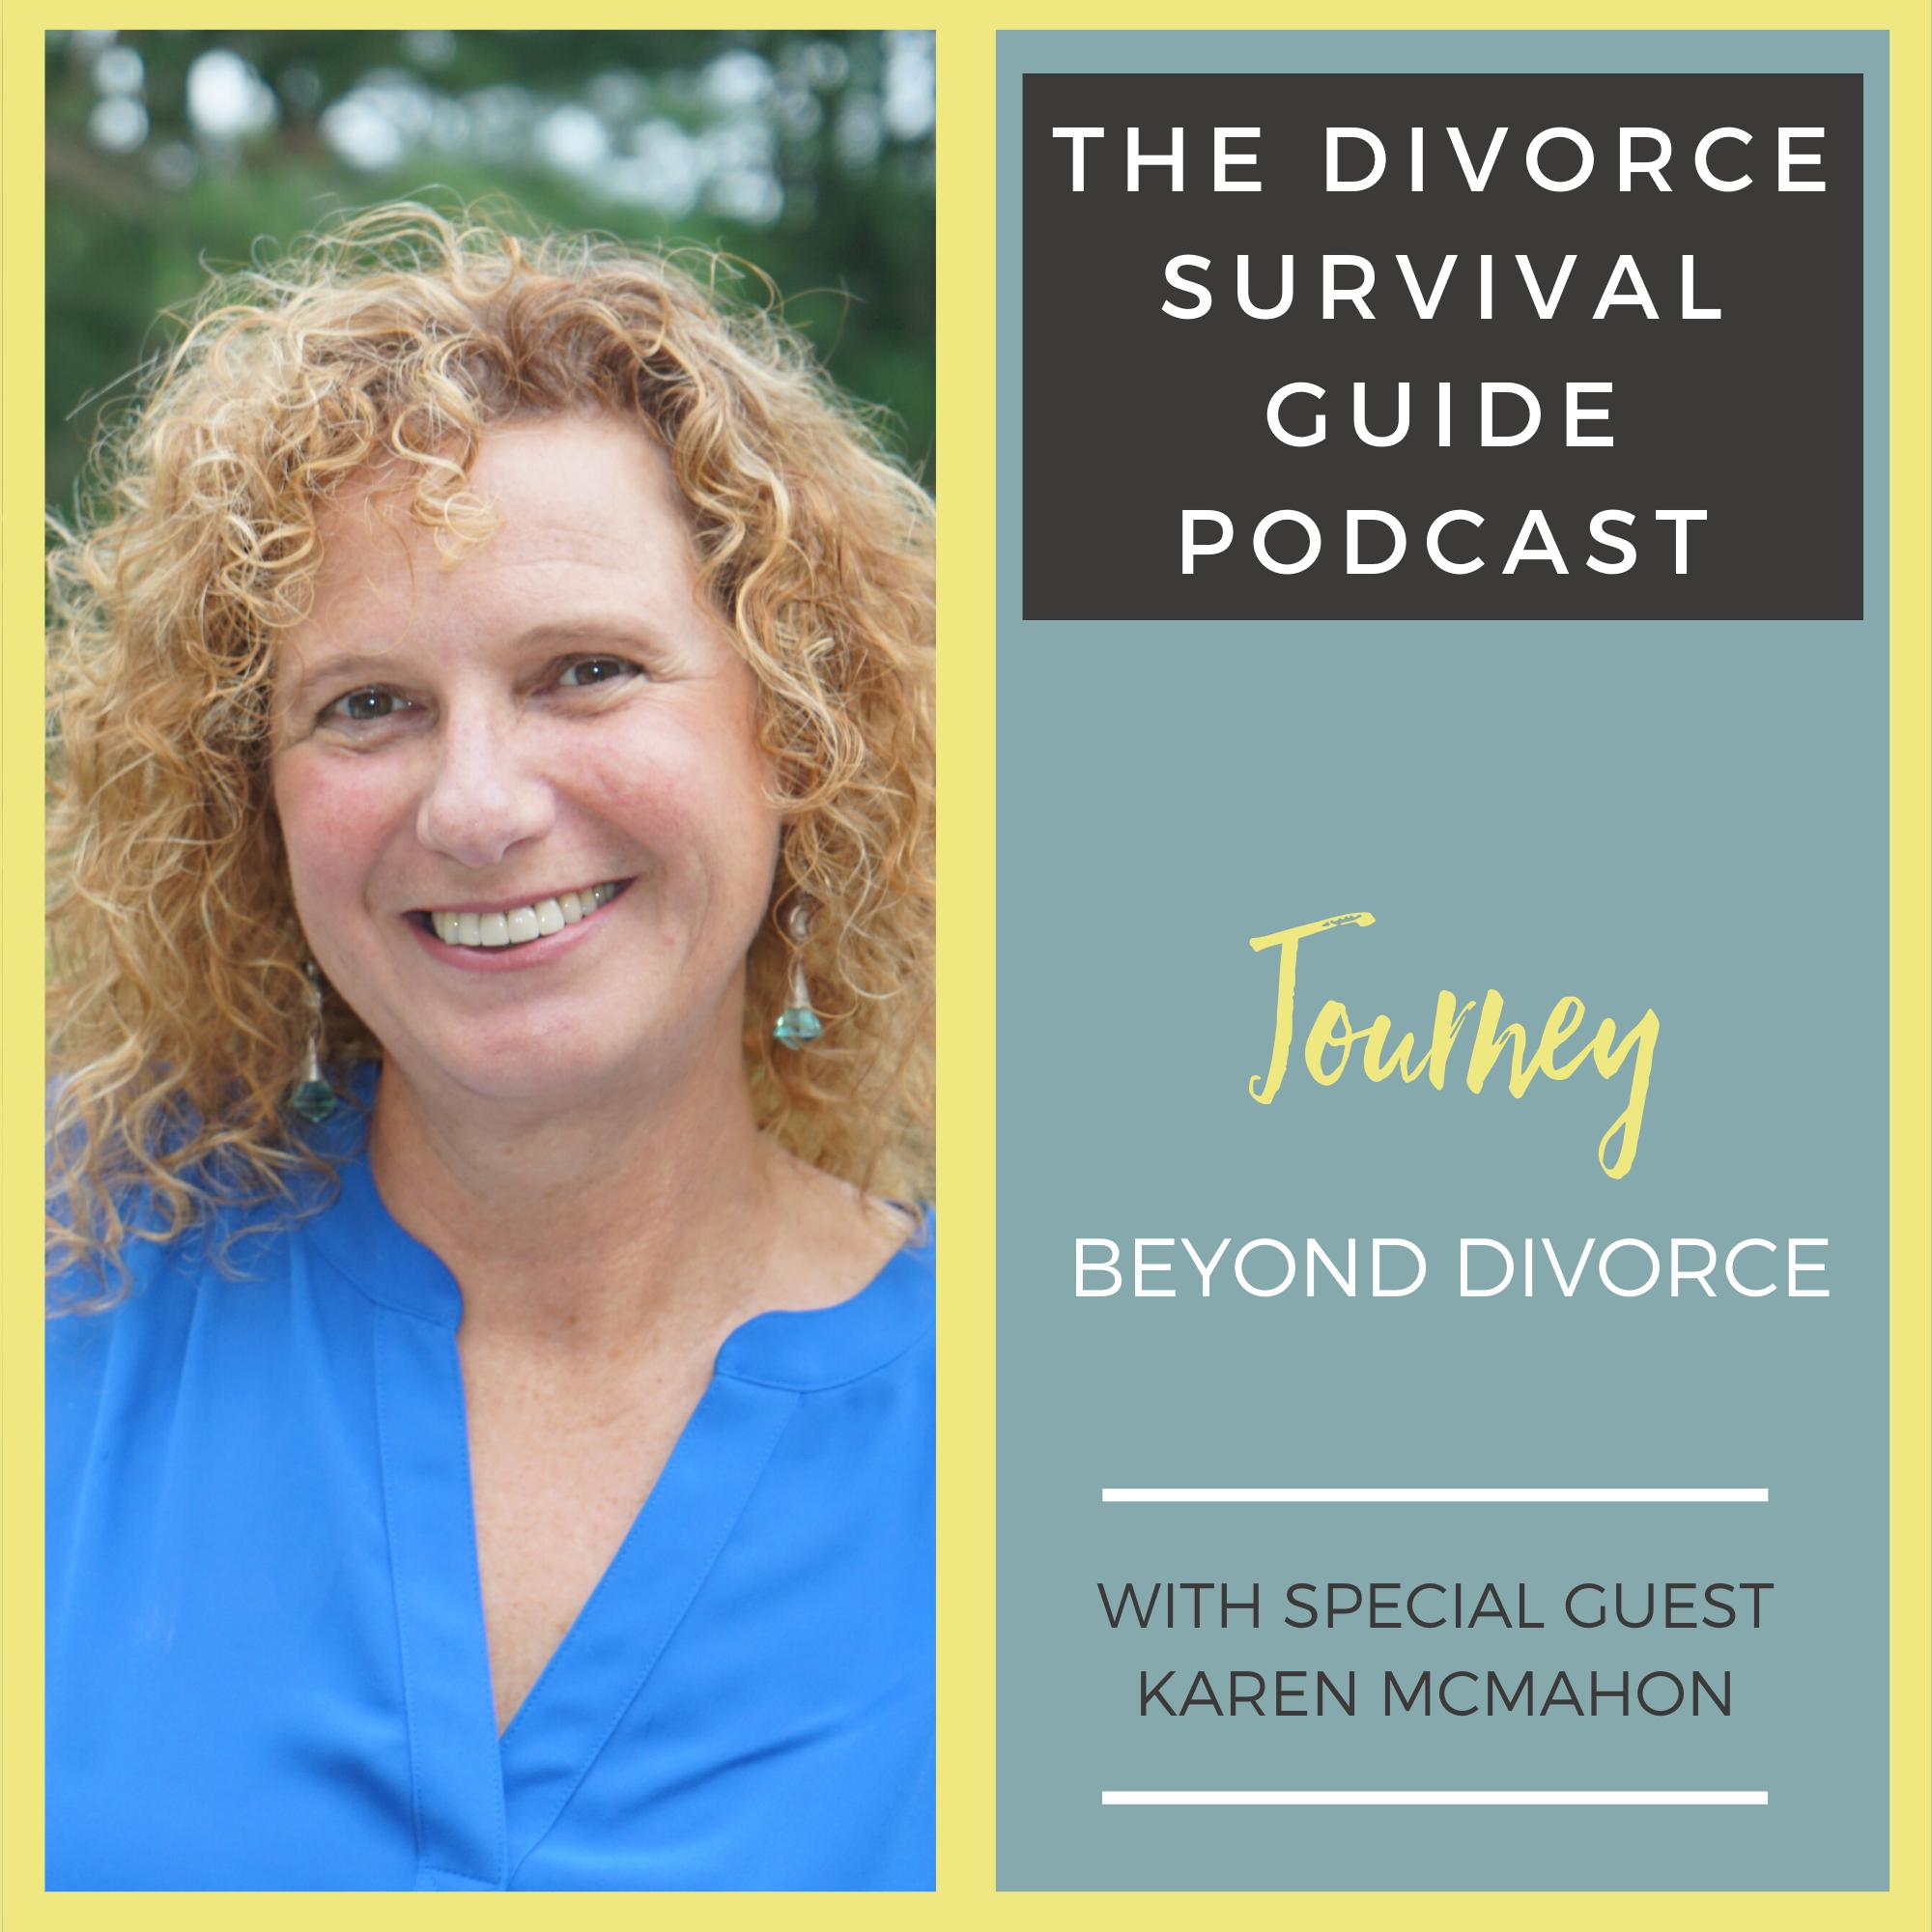 The Divorce Survival Guide Podcast - Journey Beyond Divorce with Karen McMahon